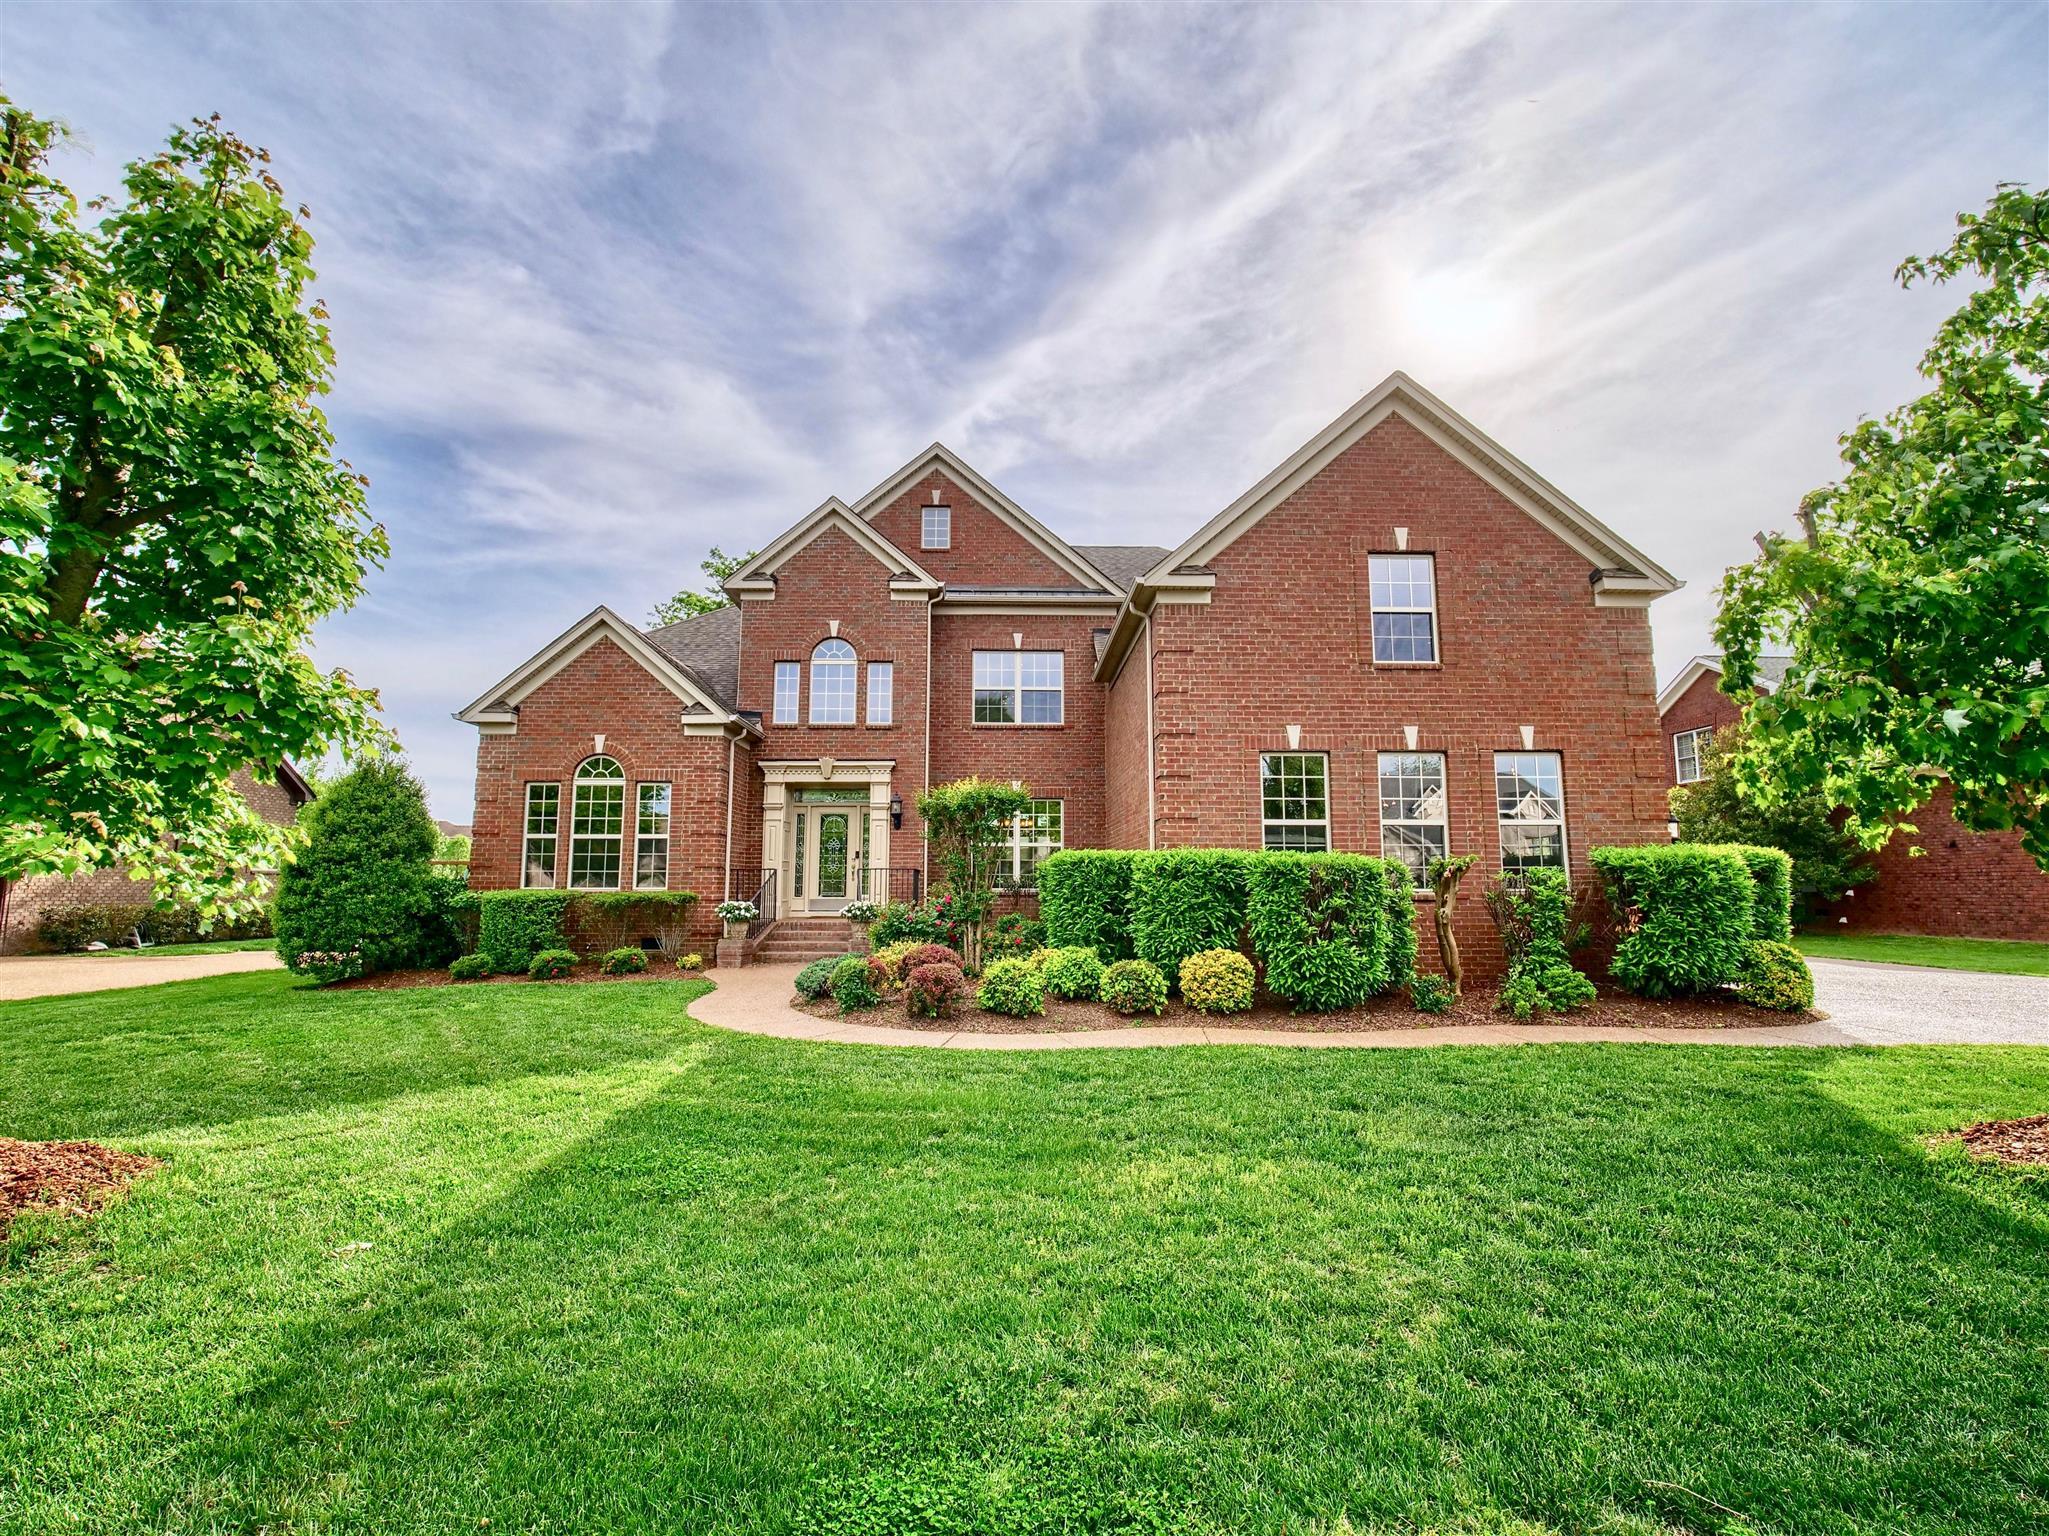 1190 Chloe Dr, Gallatin, TN 37066 - Gallatin, TN real estate listing